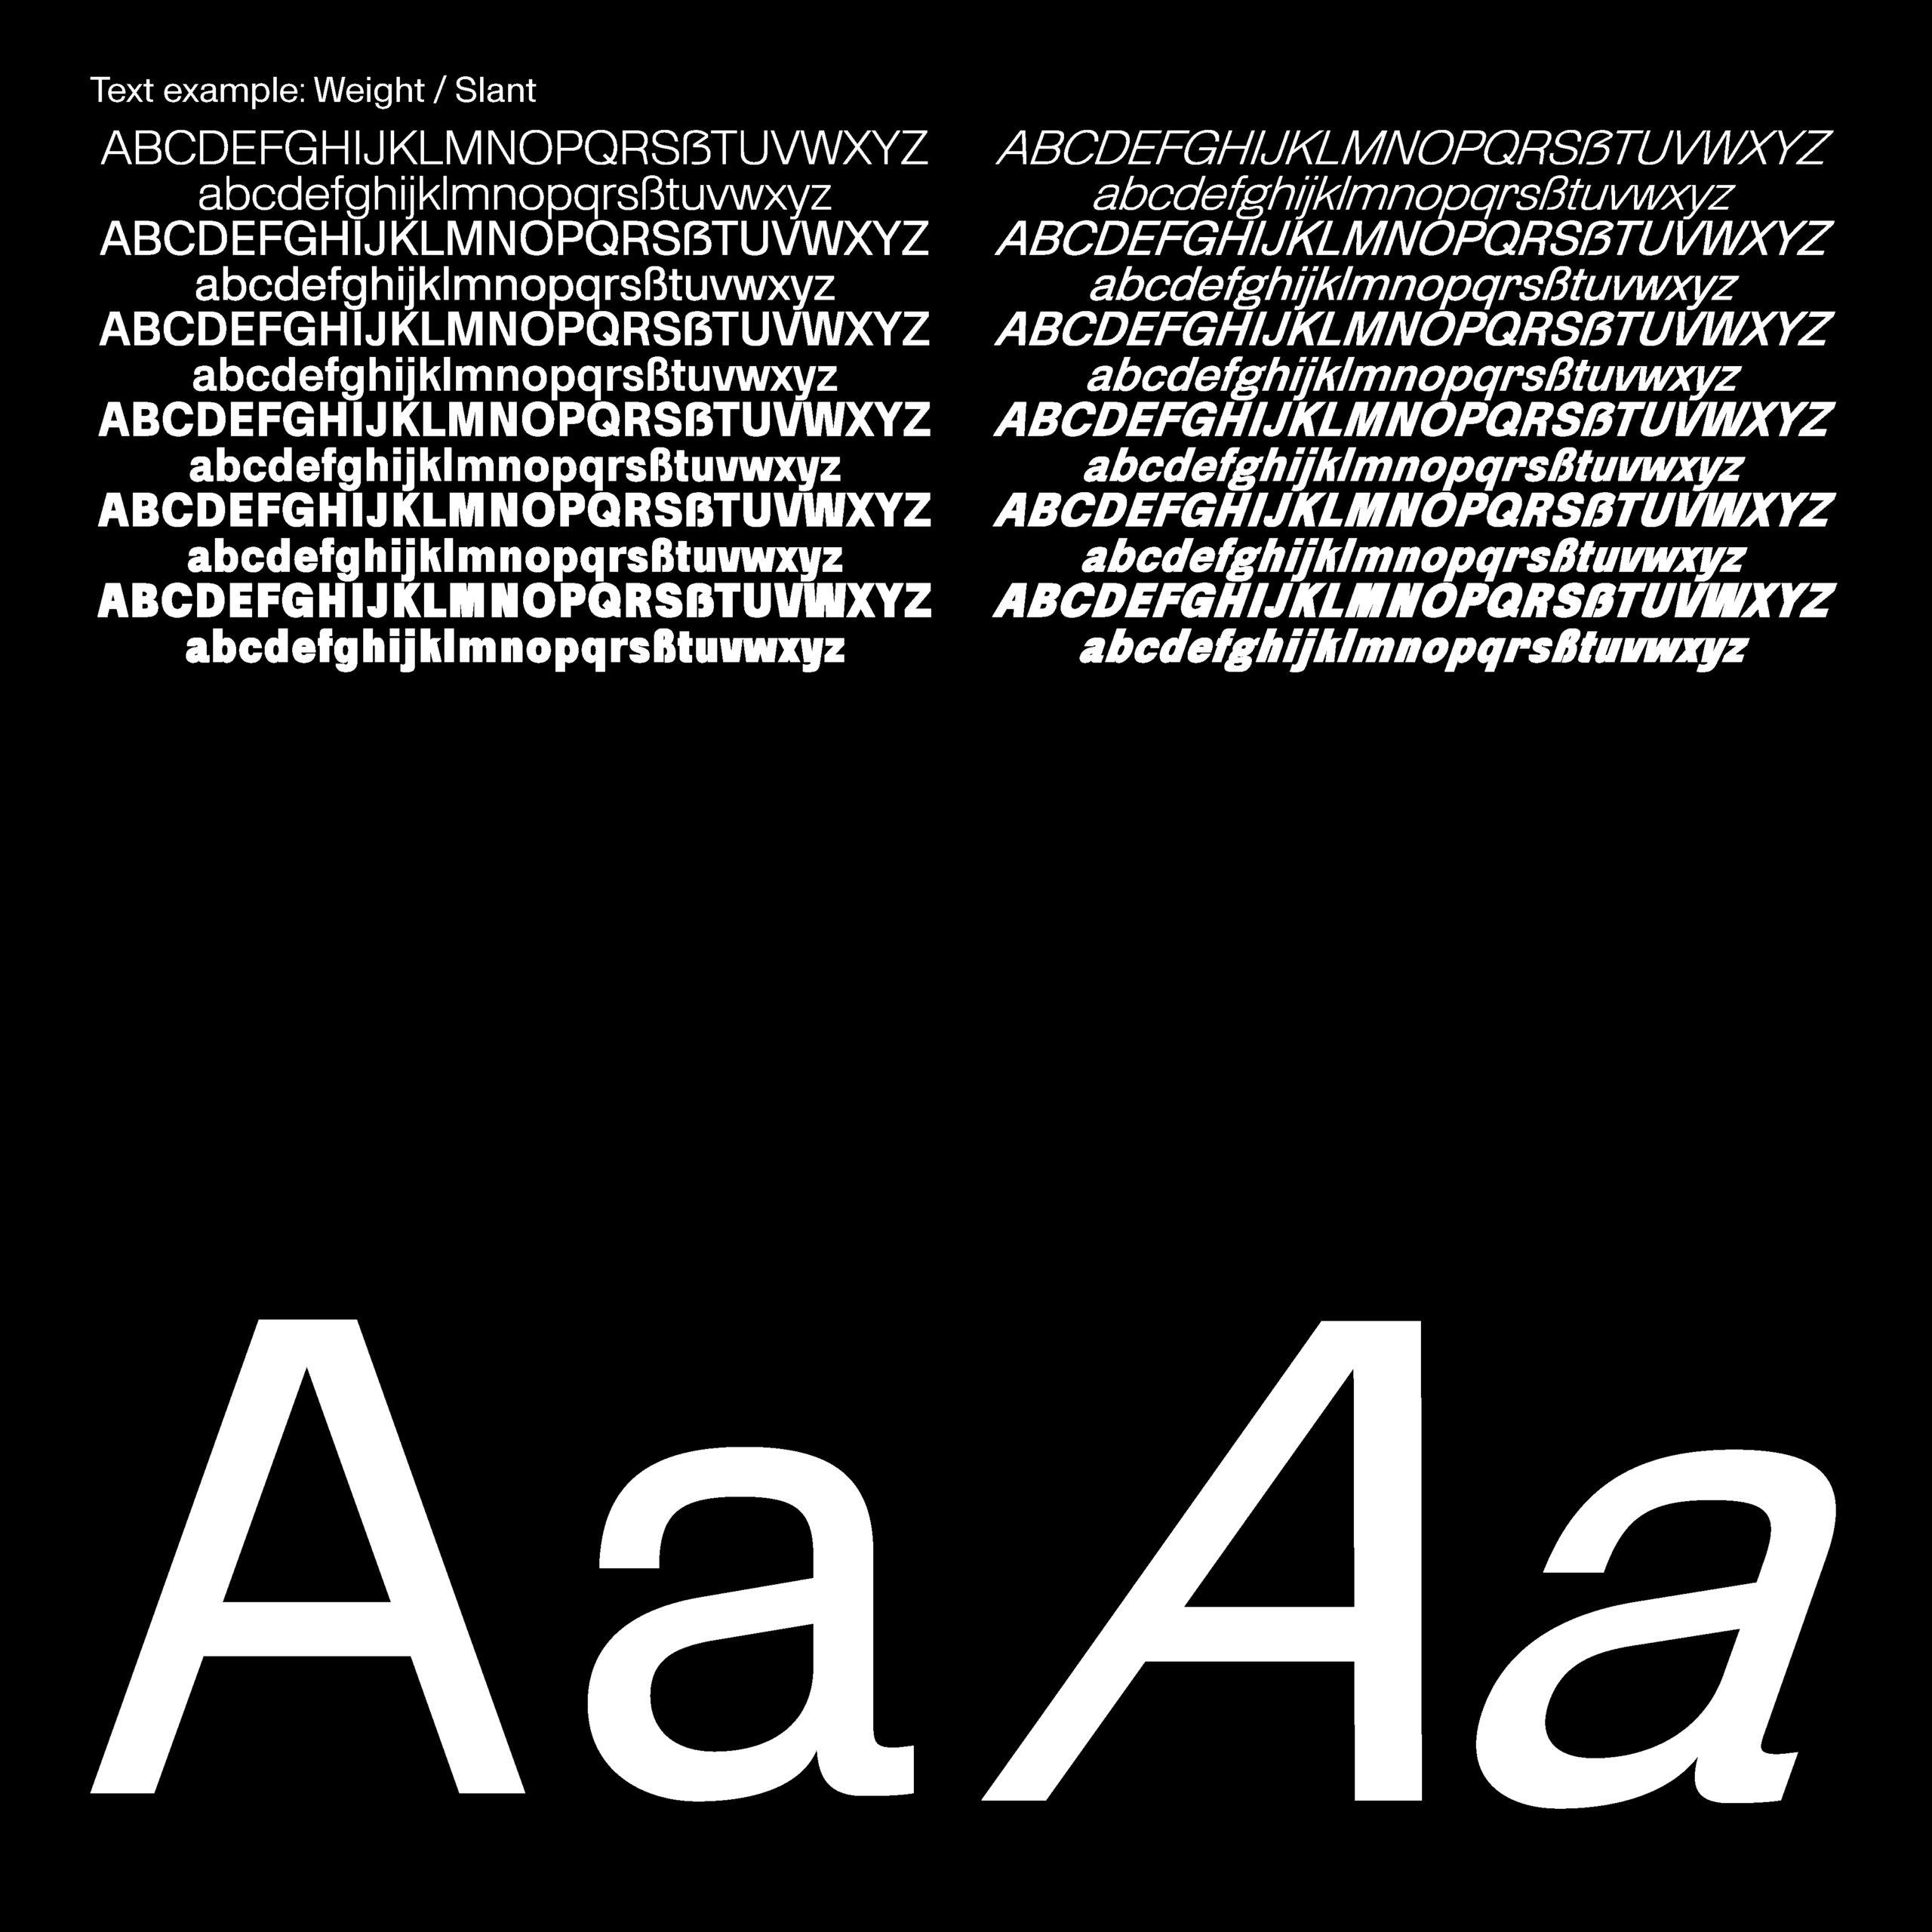 Daniel_Stuhlpfarrer_Spekulative-Schriftgestaltung-Speculative-Type-Design_WEB-new